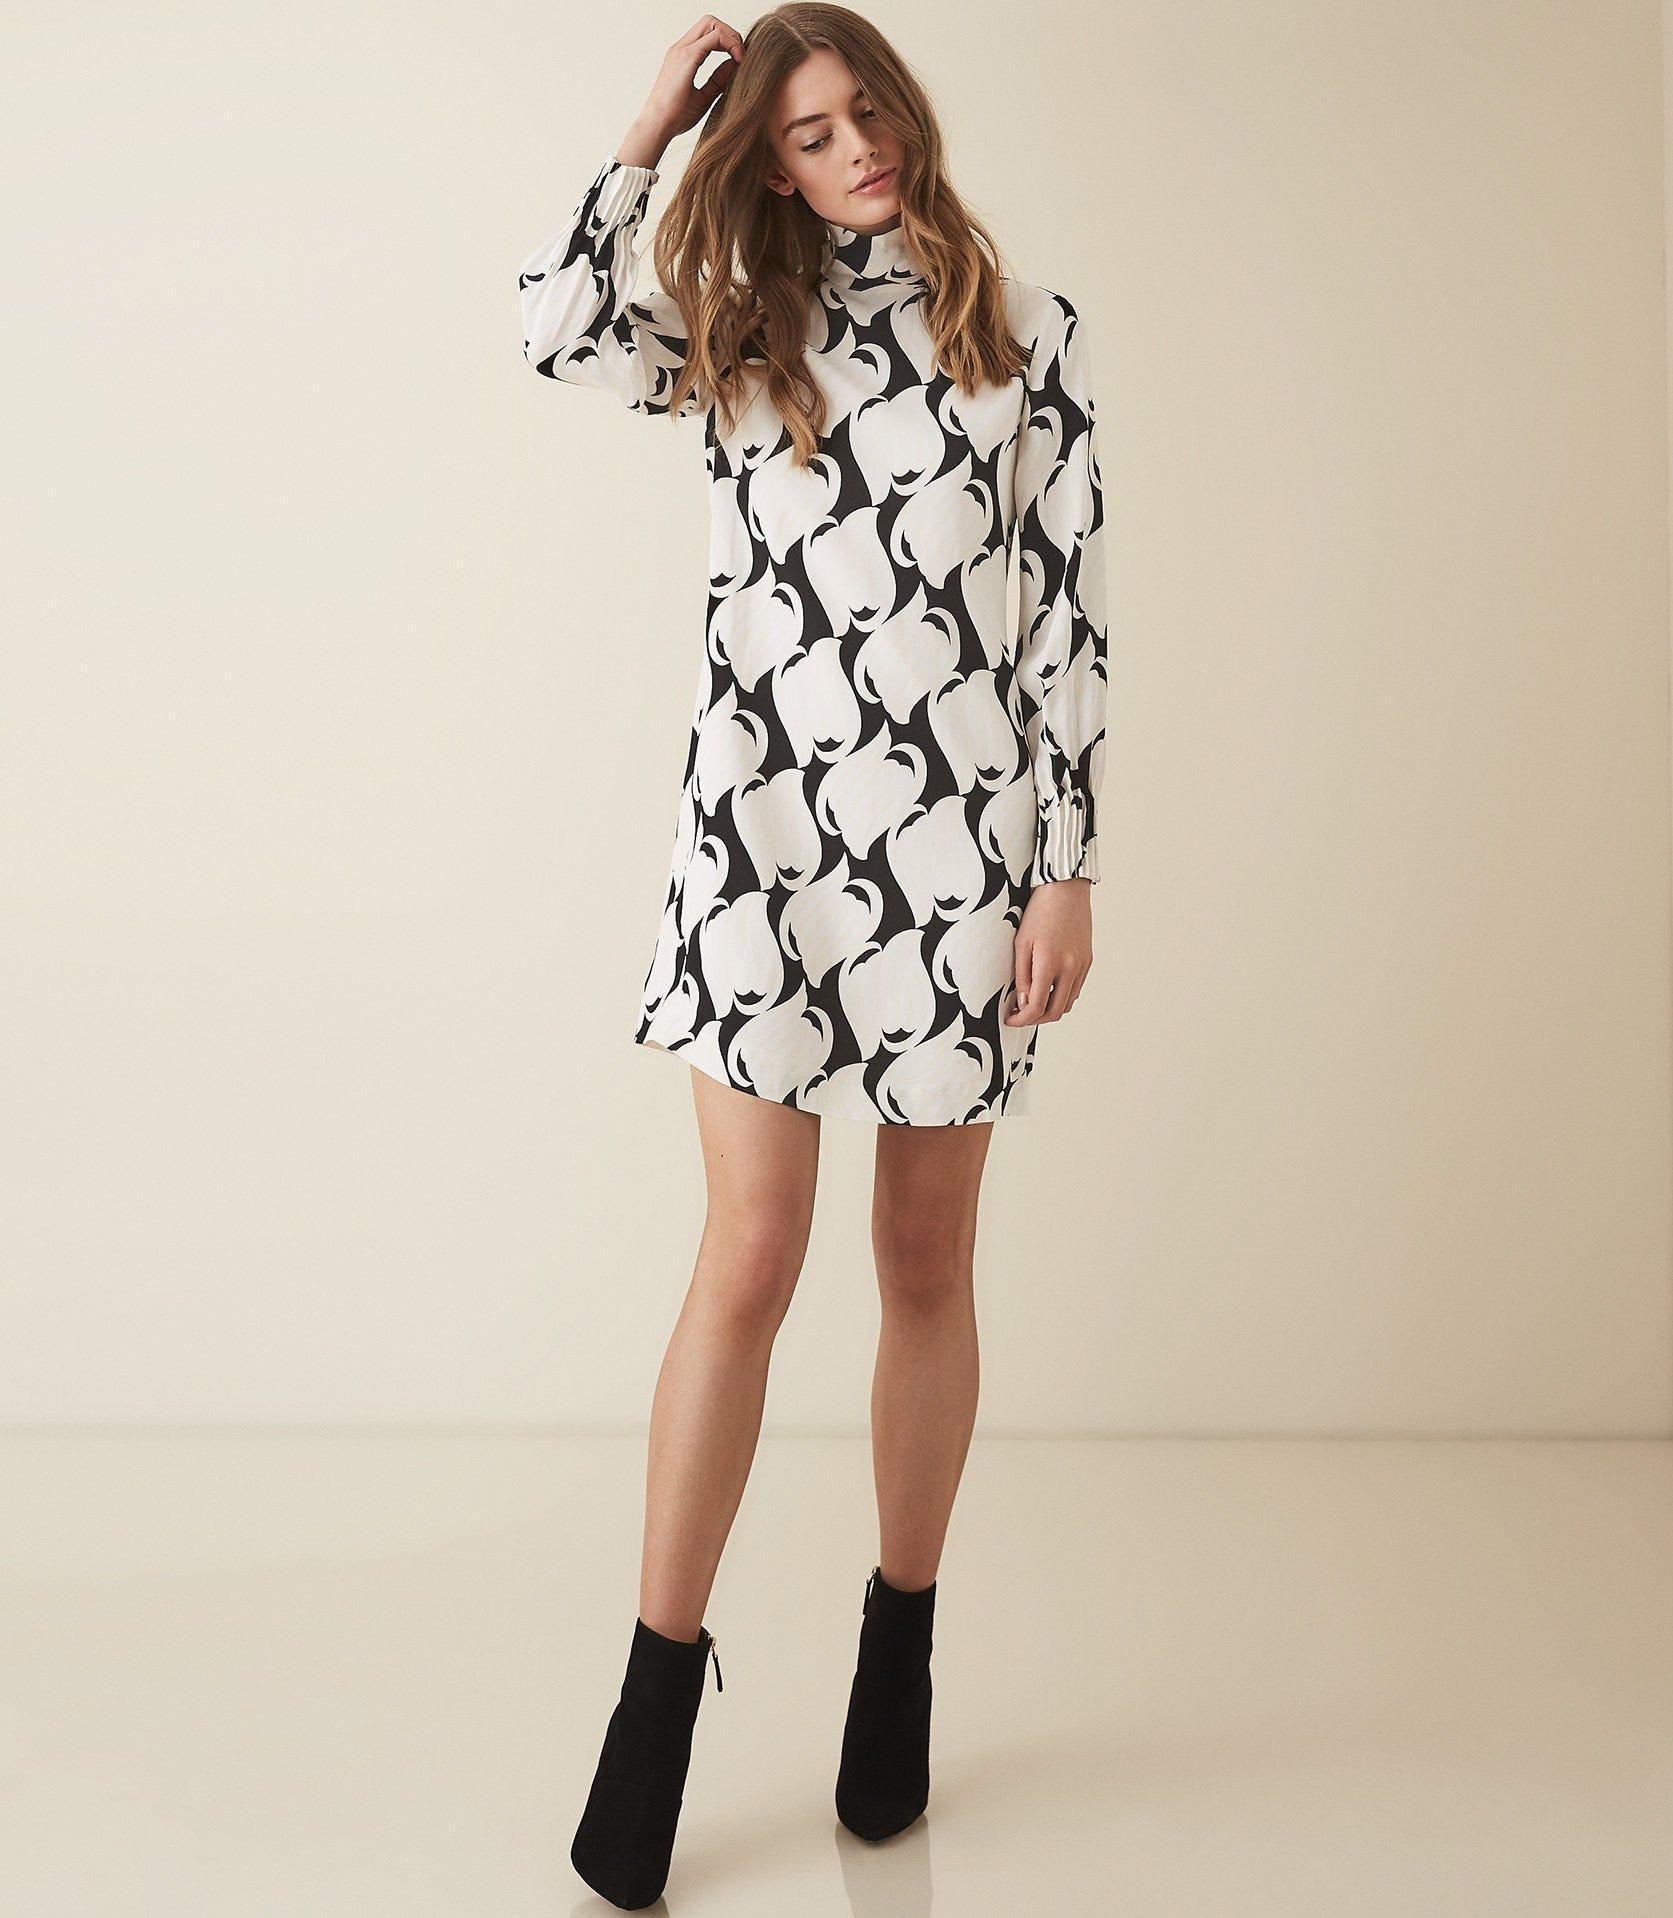 92d559a83129e Meghan Markle Pregnancy Style: Her Best Fashion Looks